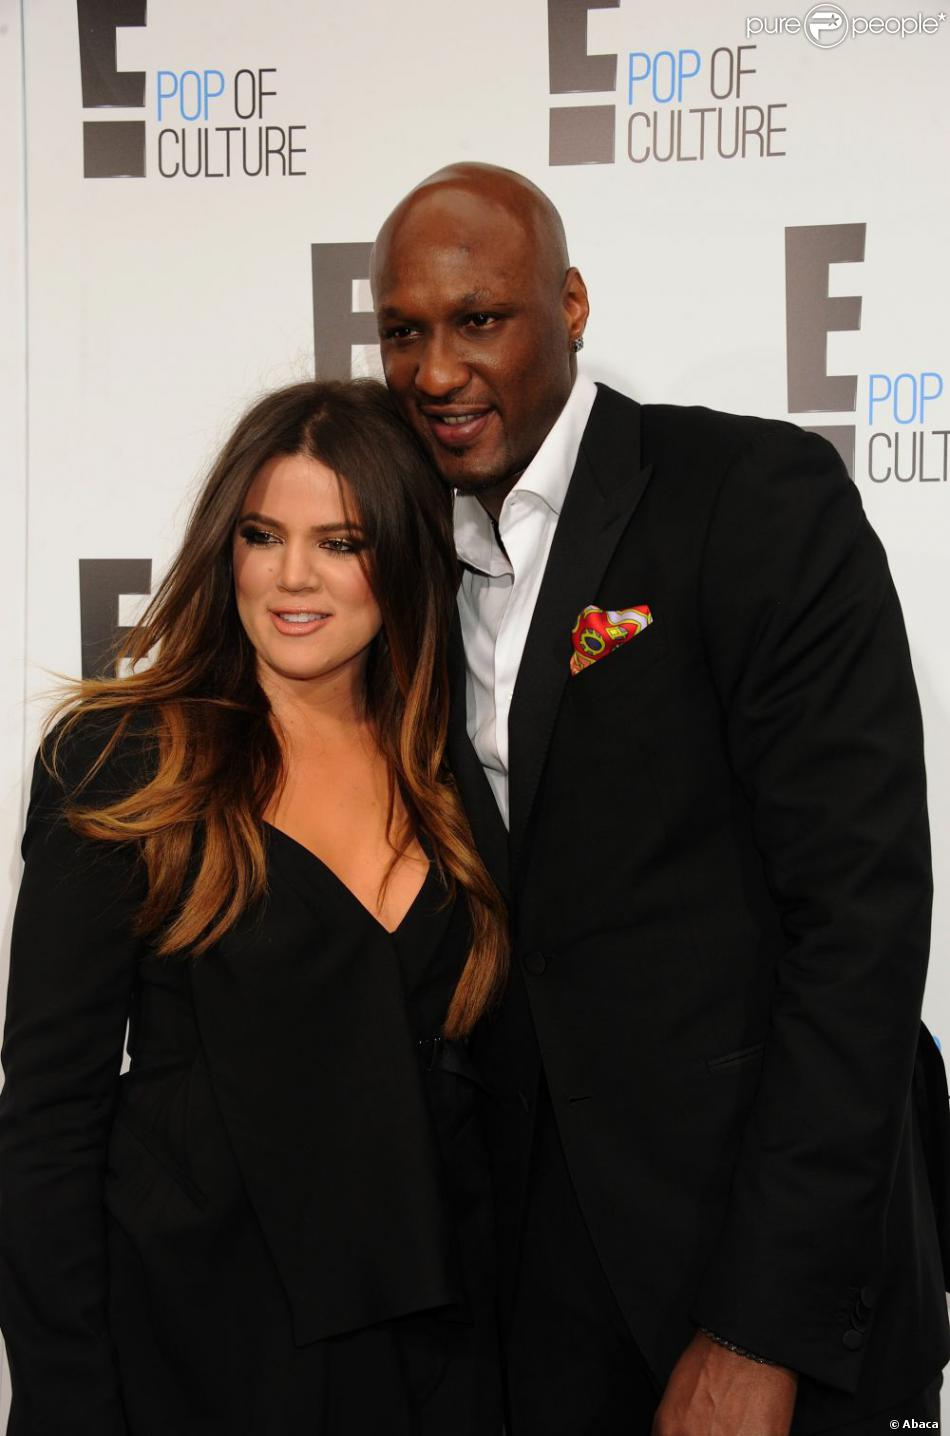 Khloé Kardashian et Lamar Odom à New York, le 30 avril 2013.